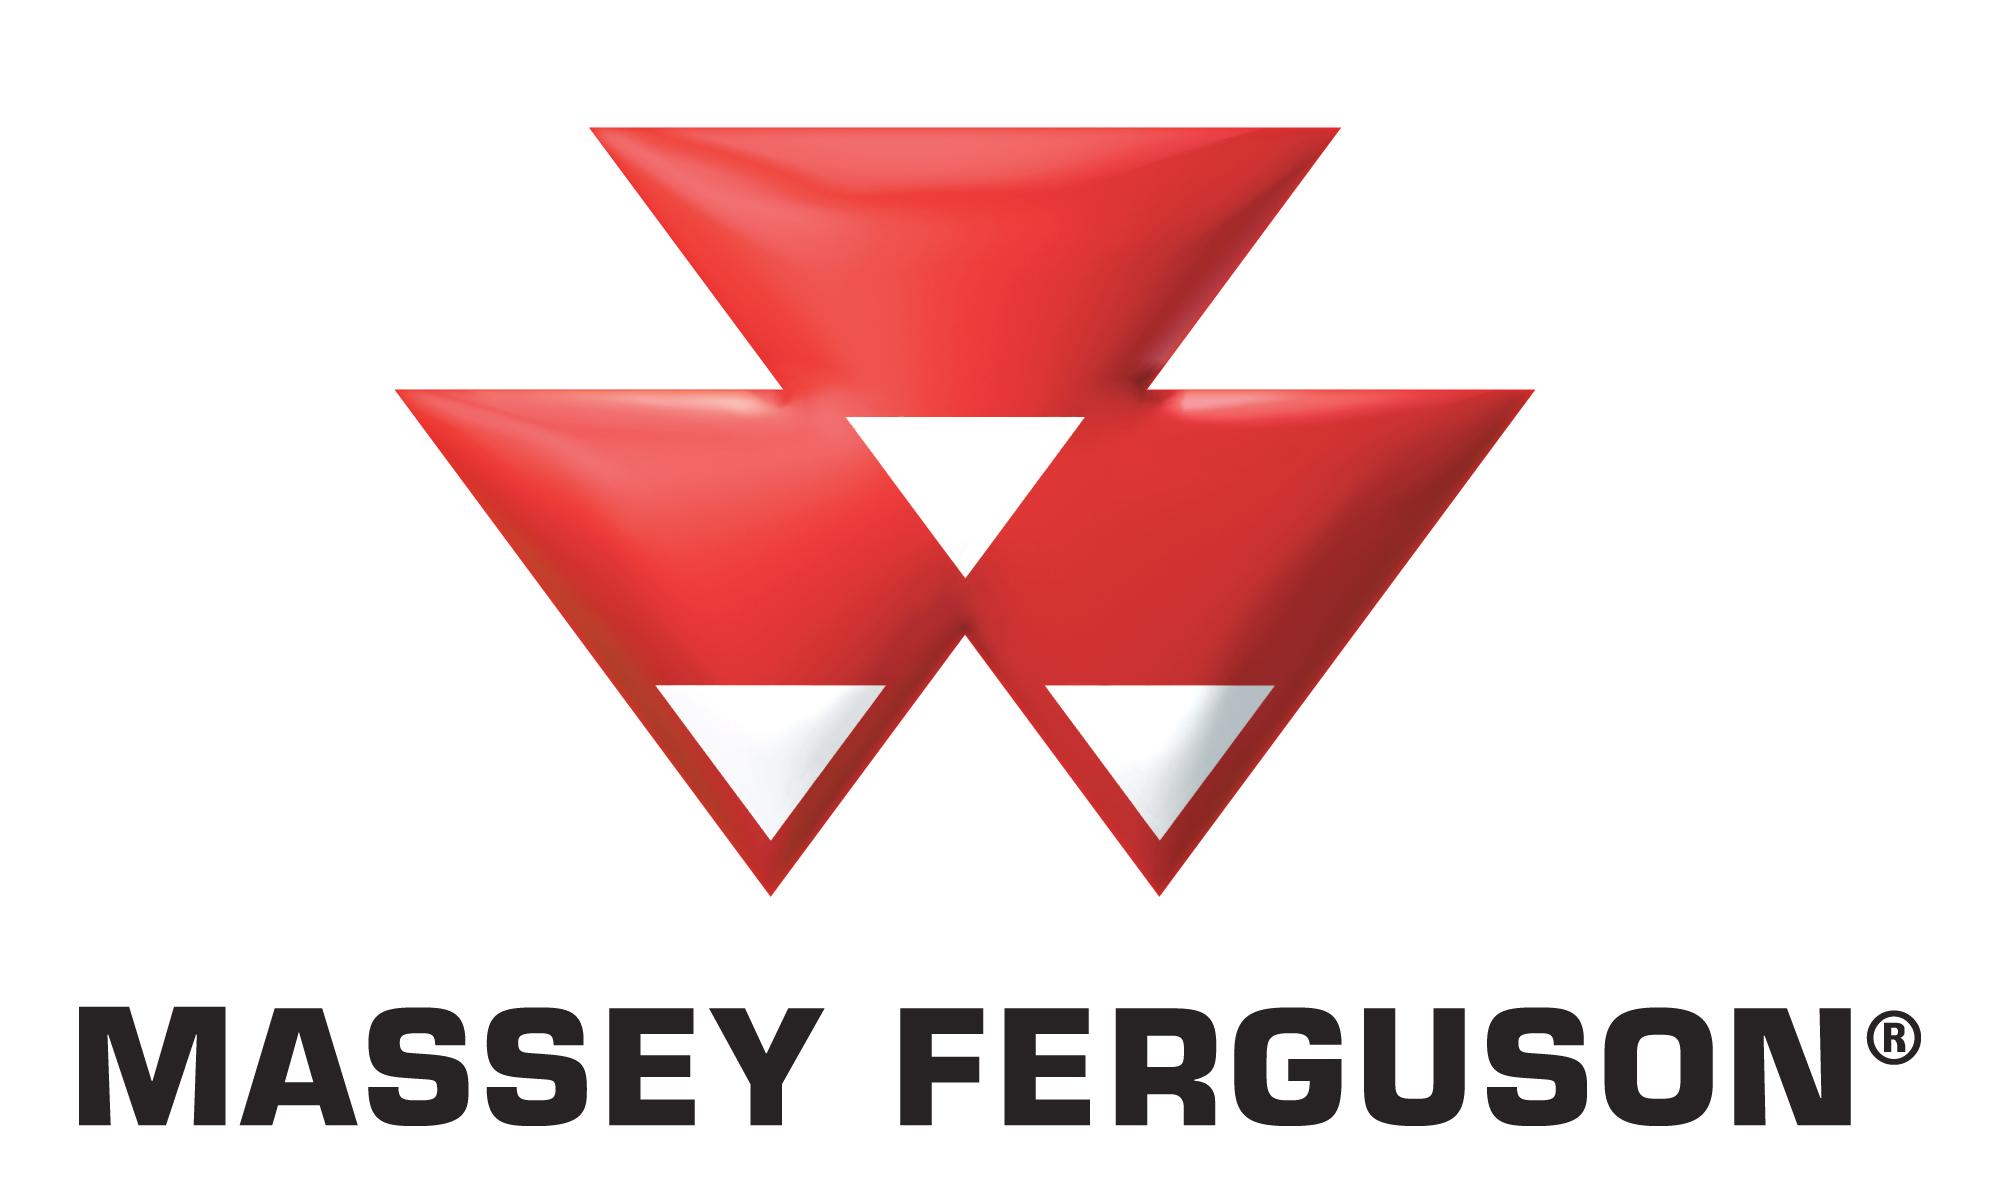 Massey Ferguson Symbol Wallpaper